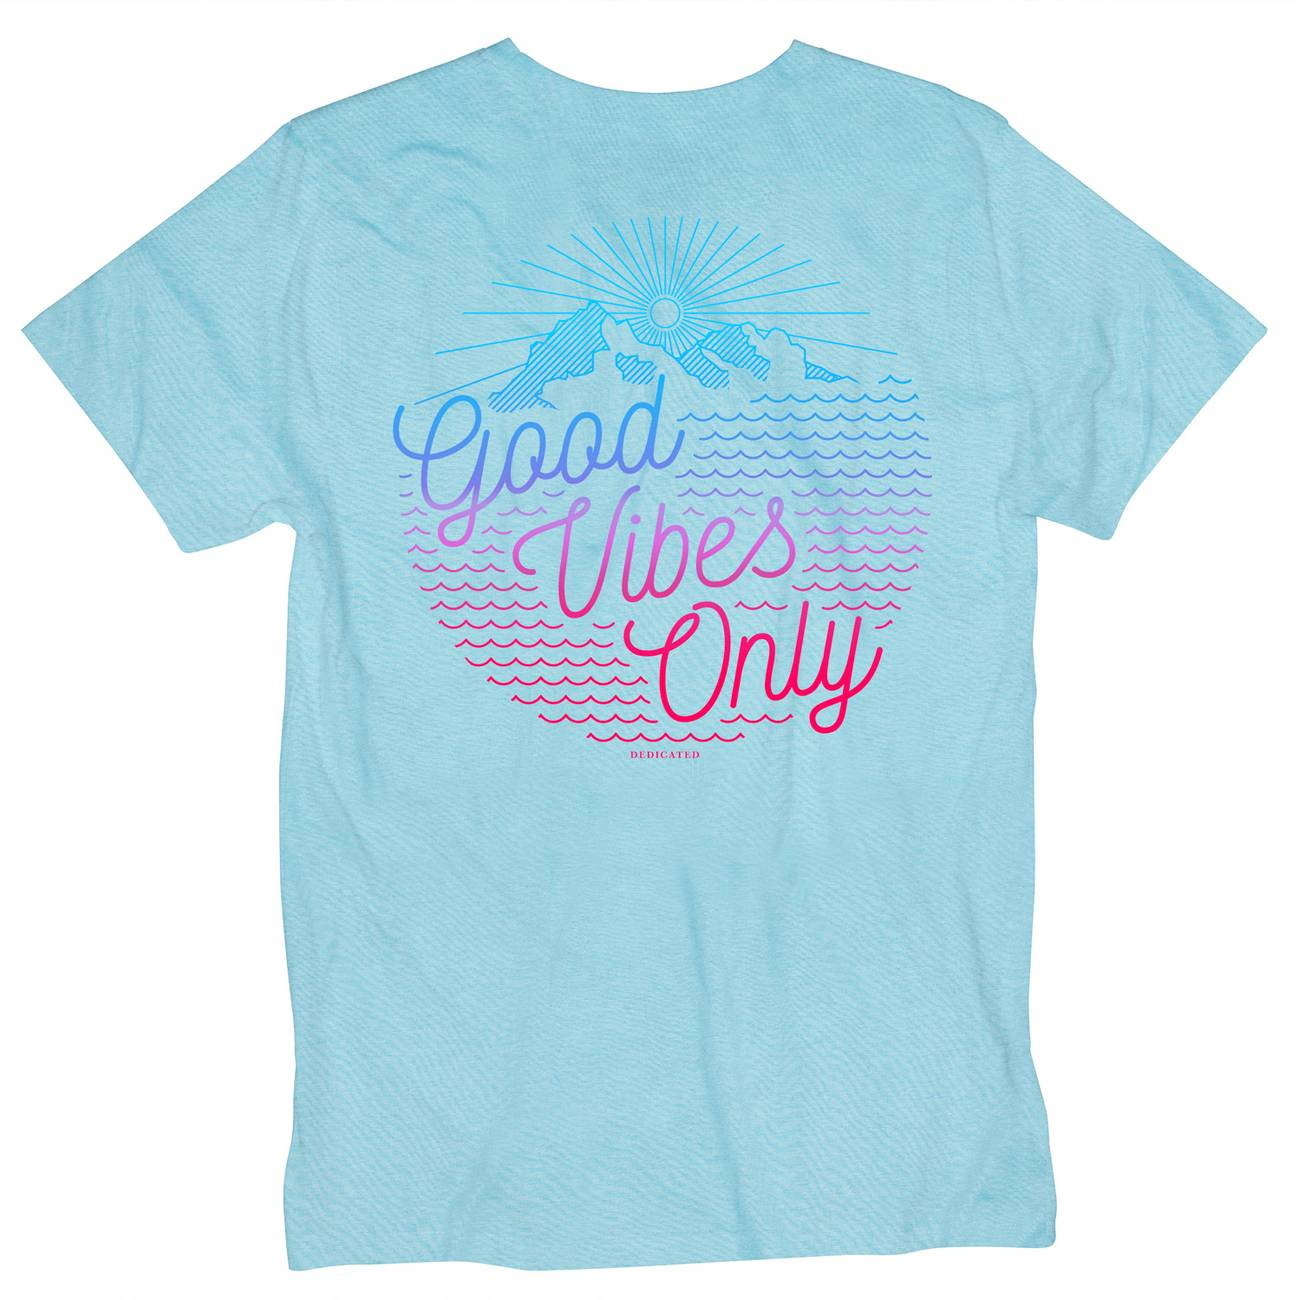 Stockholm T-shirt Outdoor Vibes Powder Blue